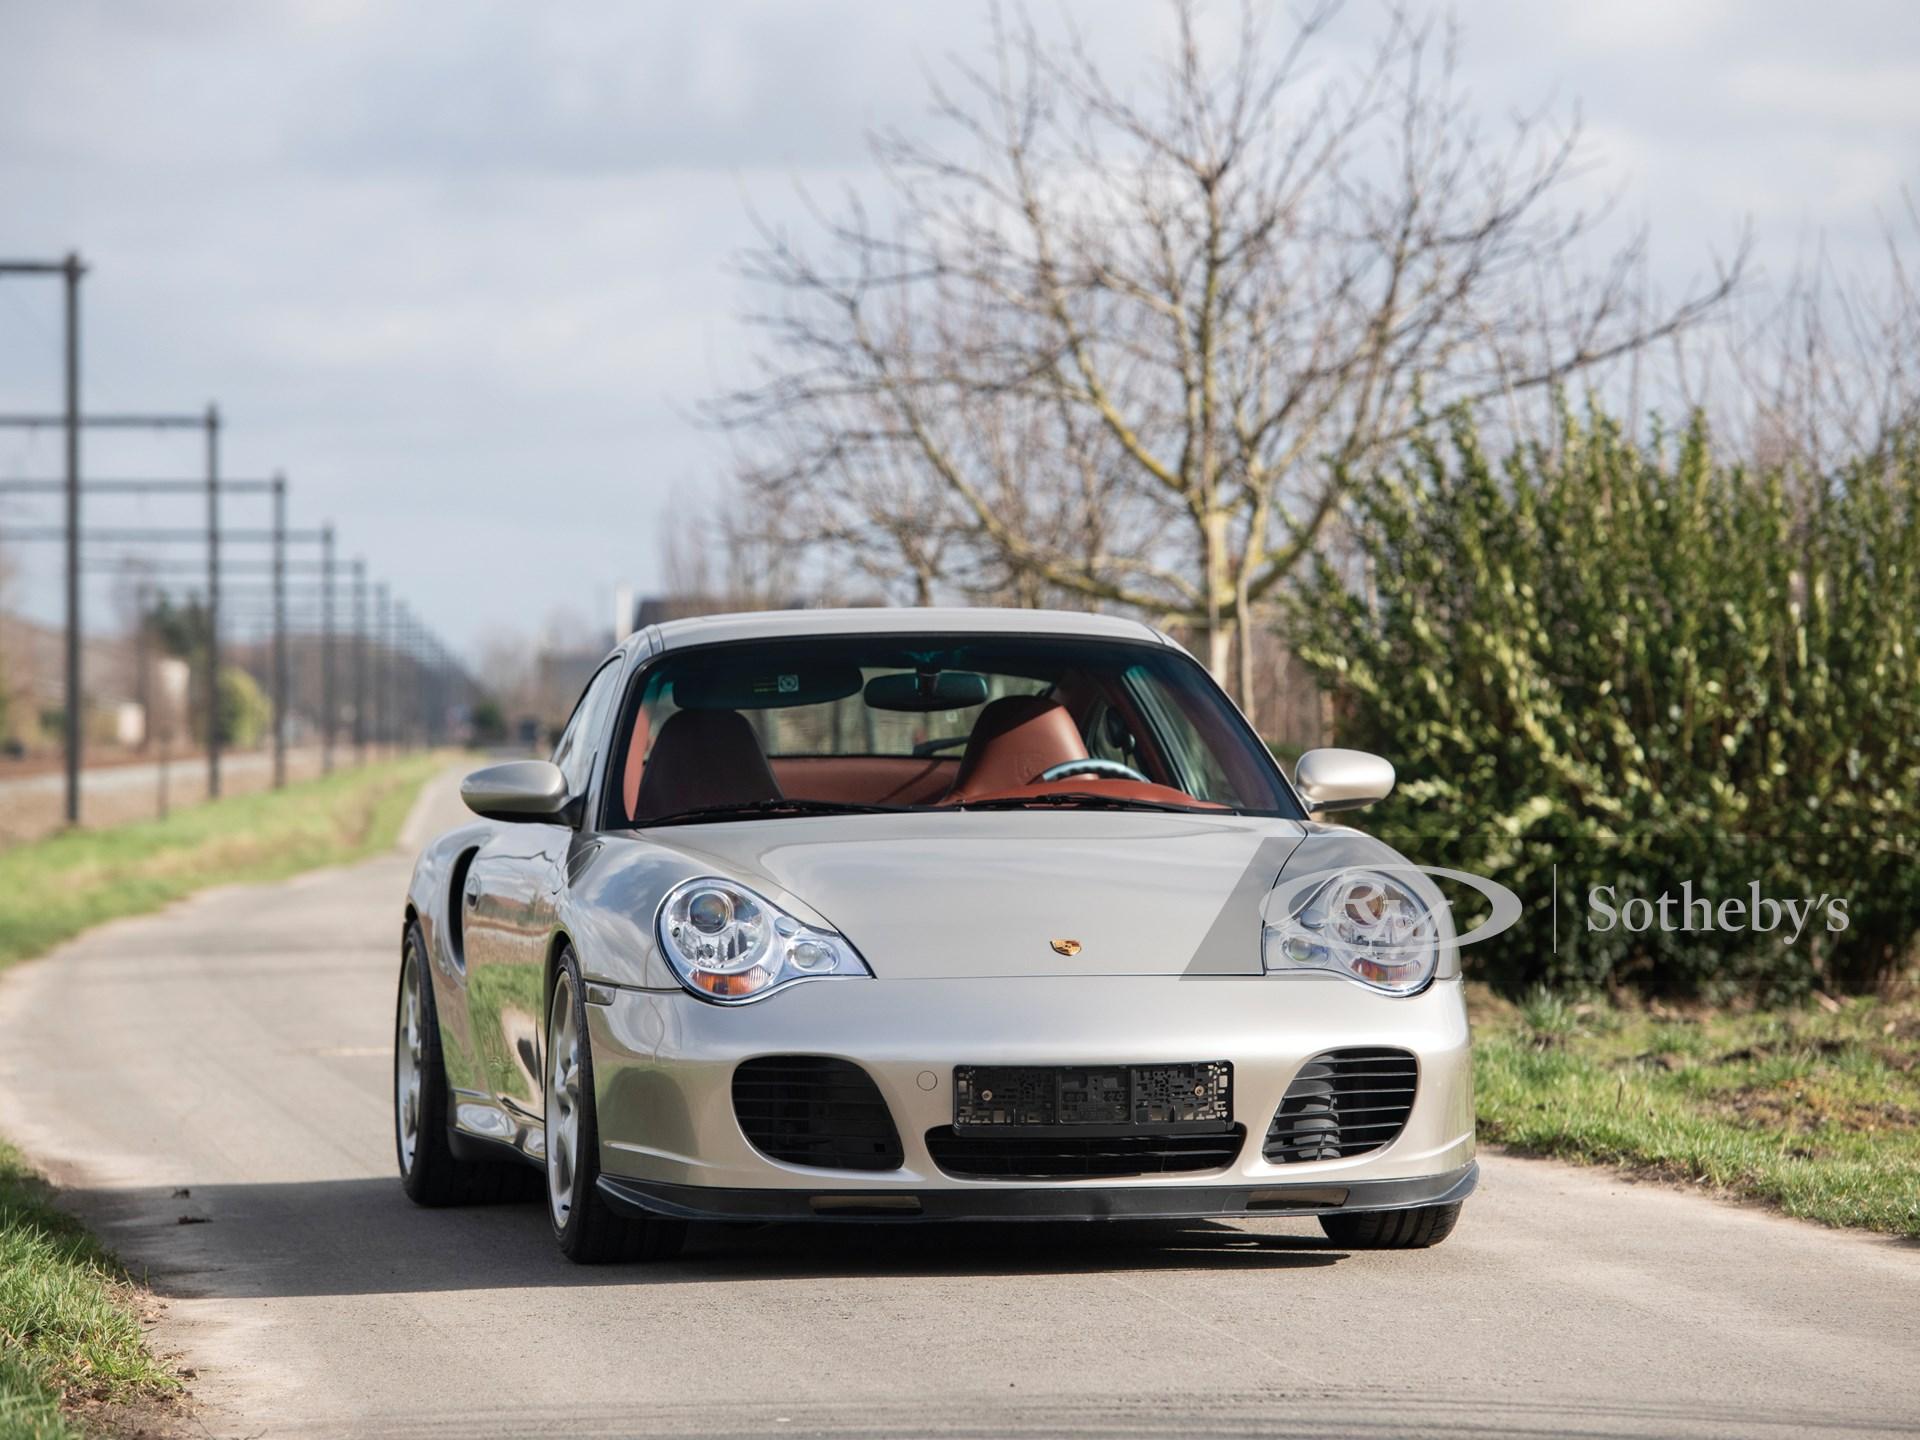 2005 Porsche 911 Turbo S Coupé  -